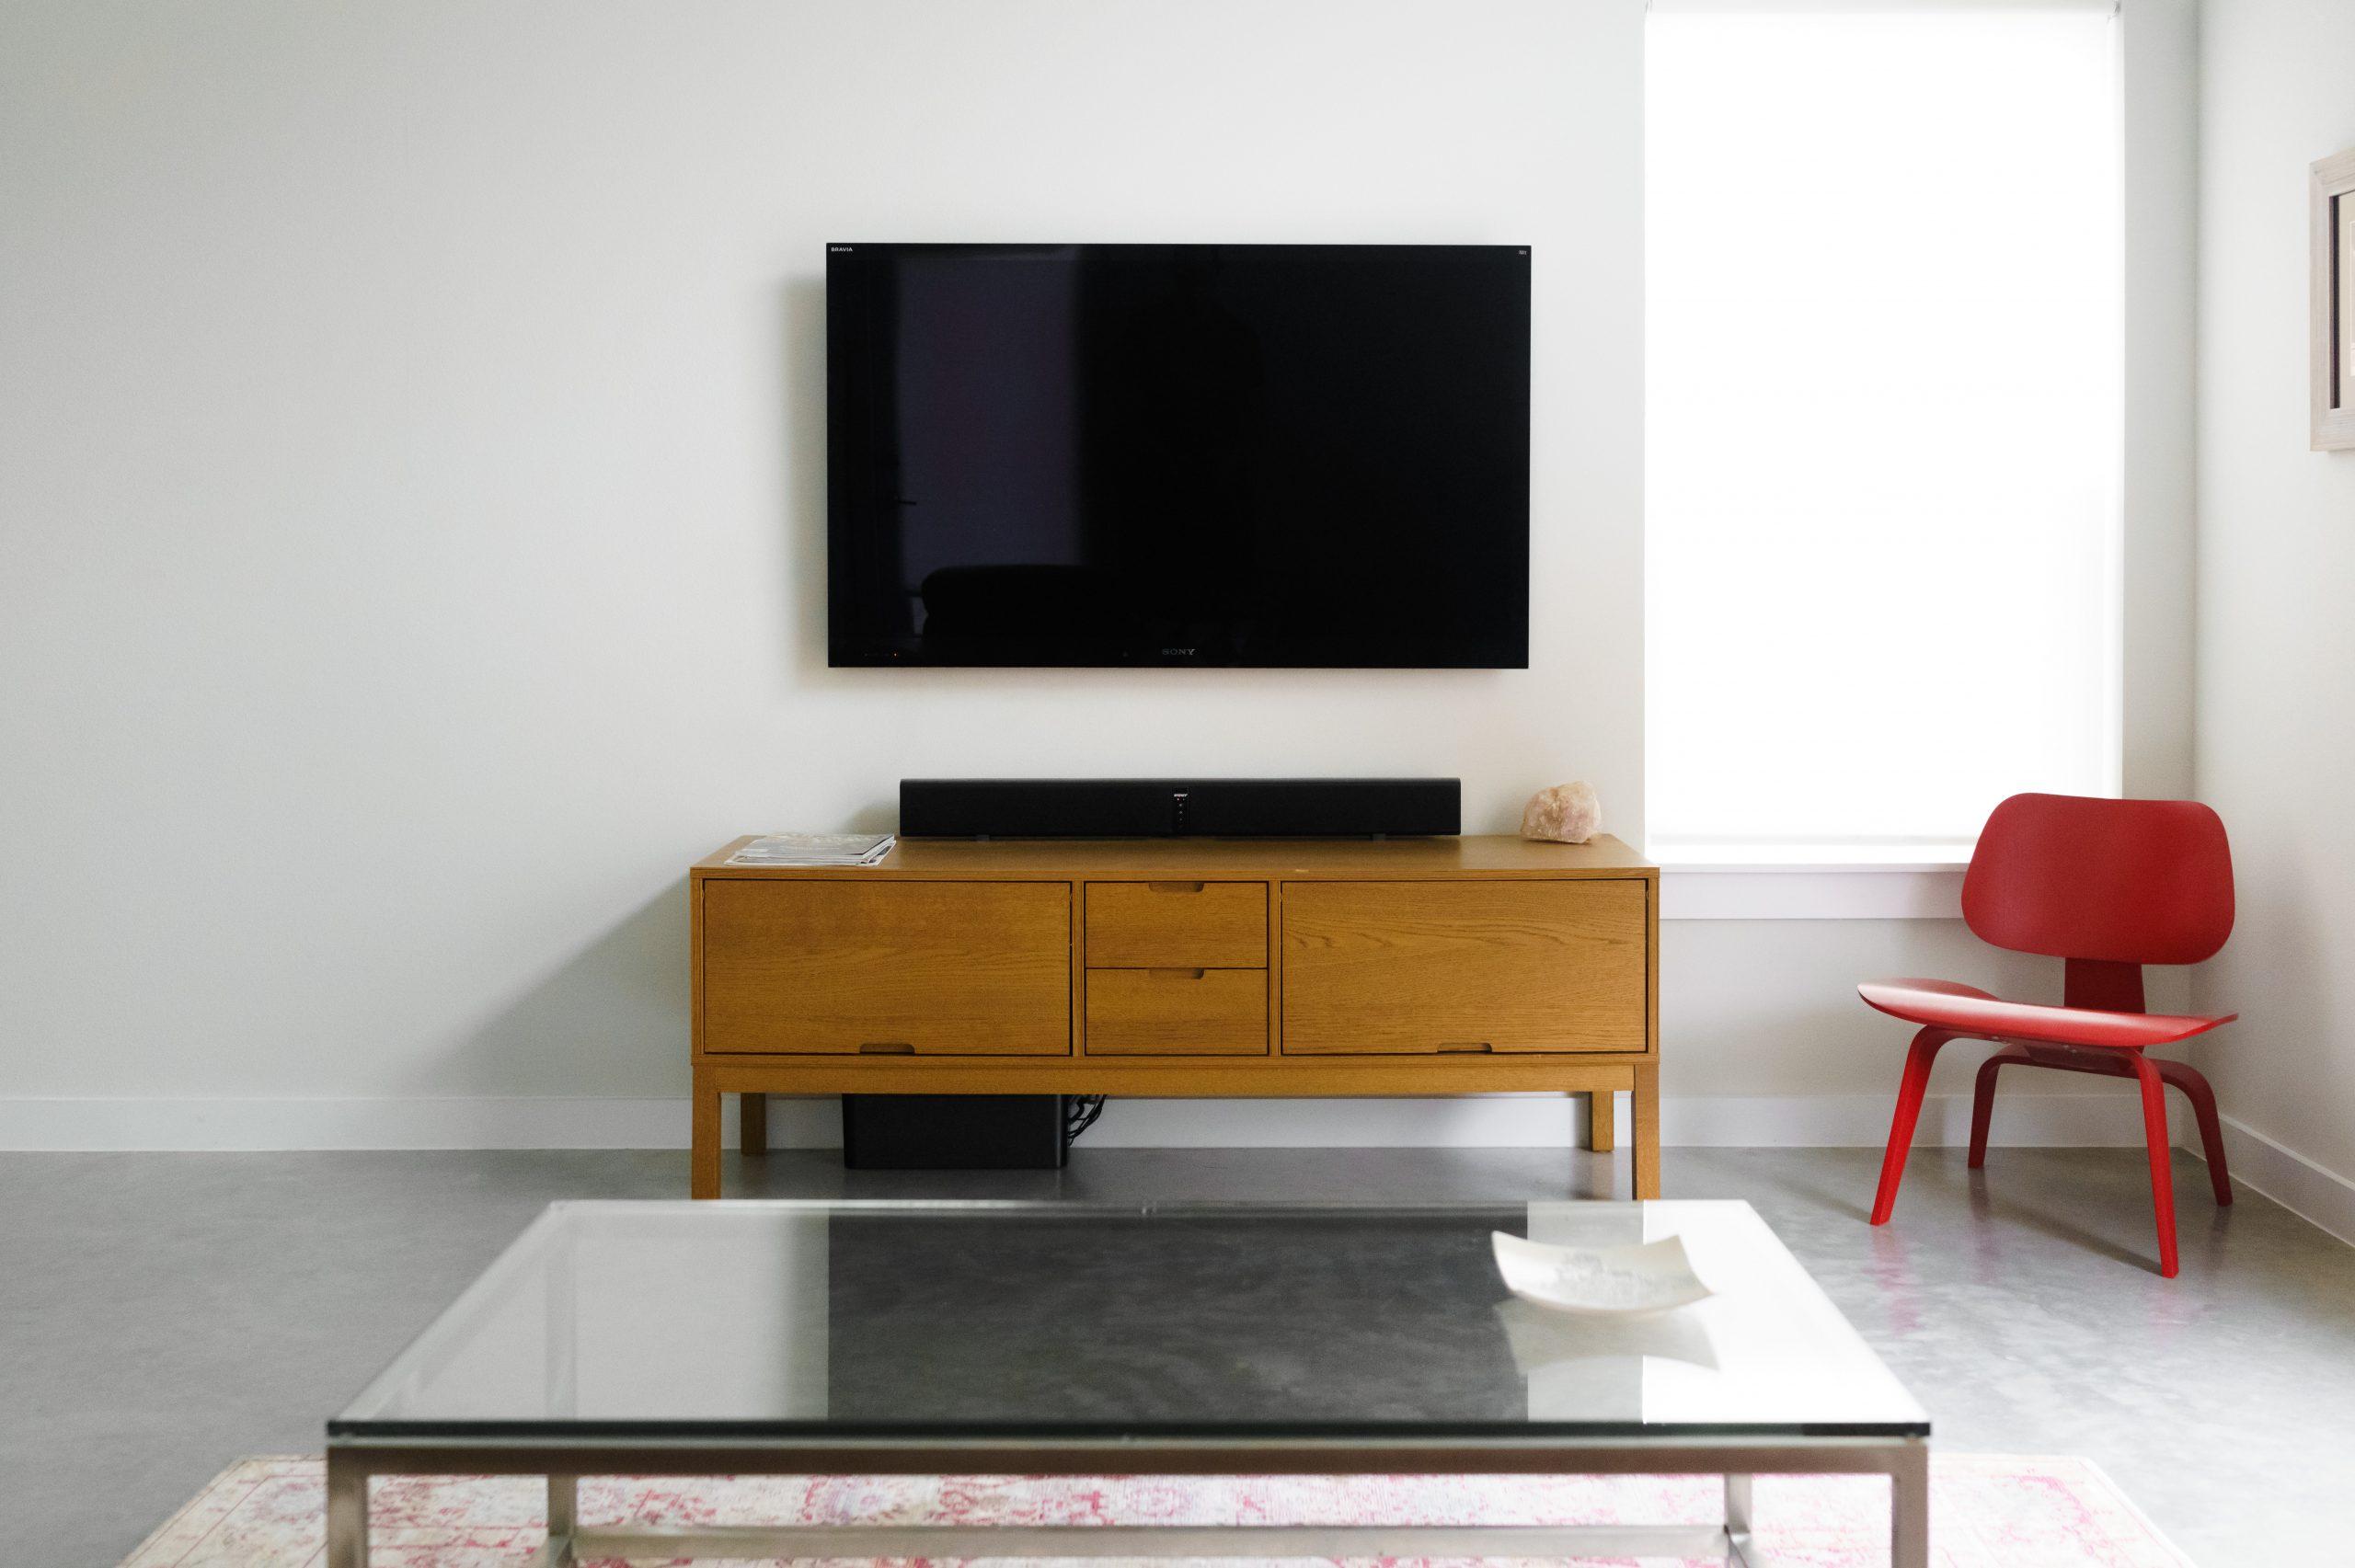 televisor con barra de sonido